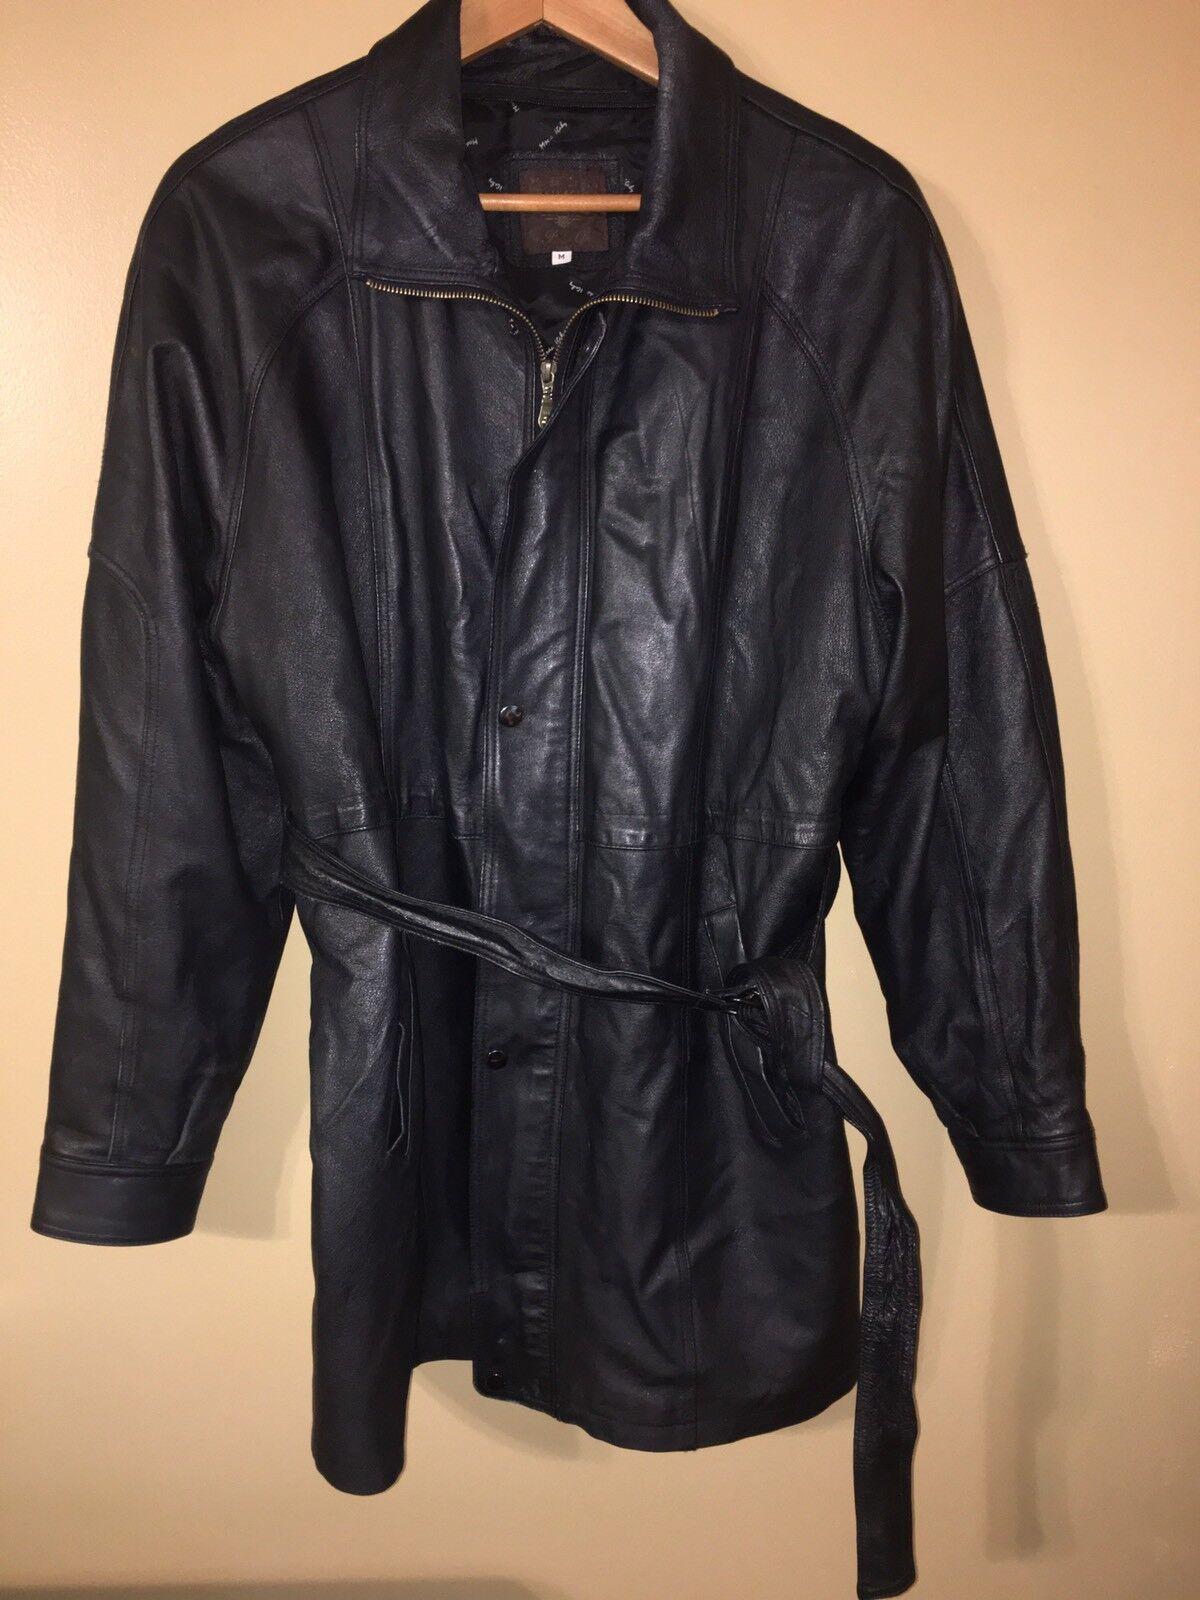 Moda italy bellagio mens Leder coat Größe M